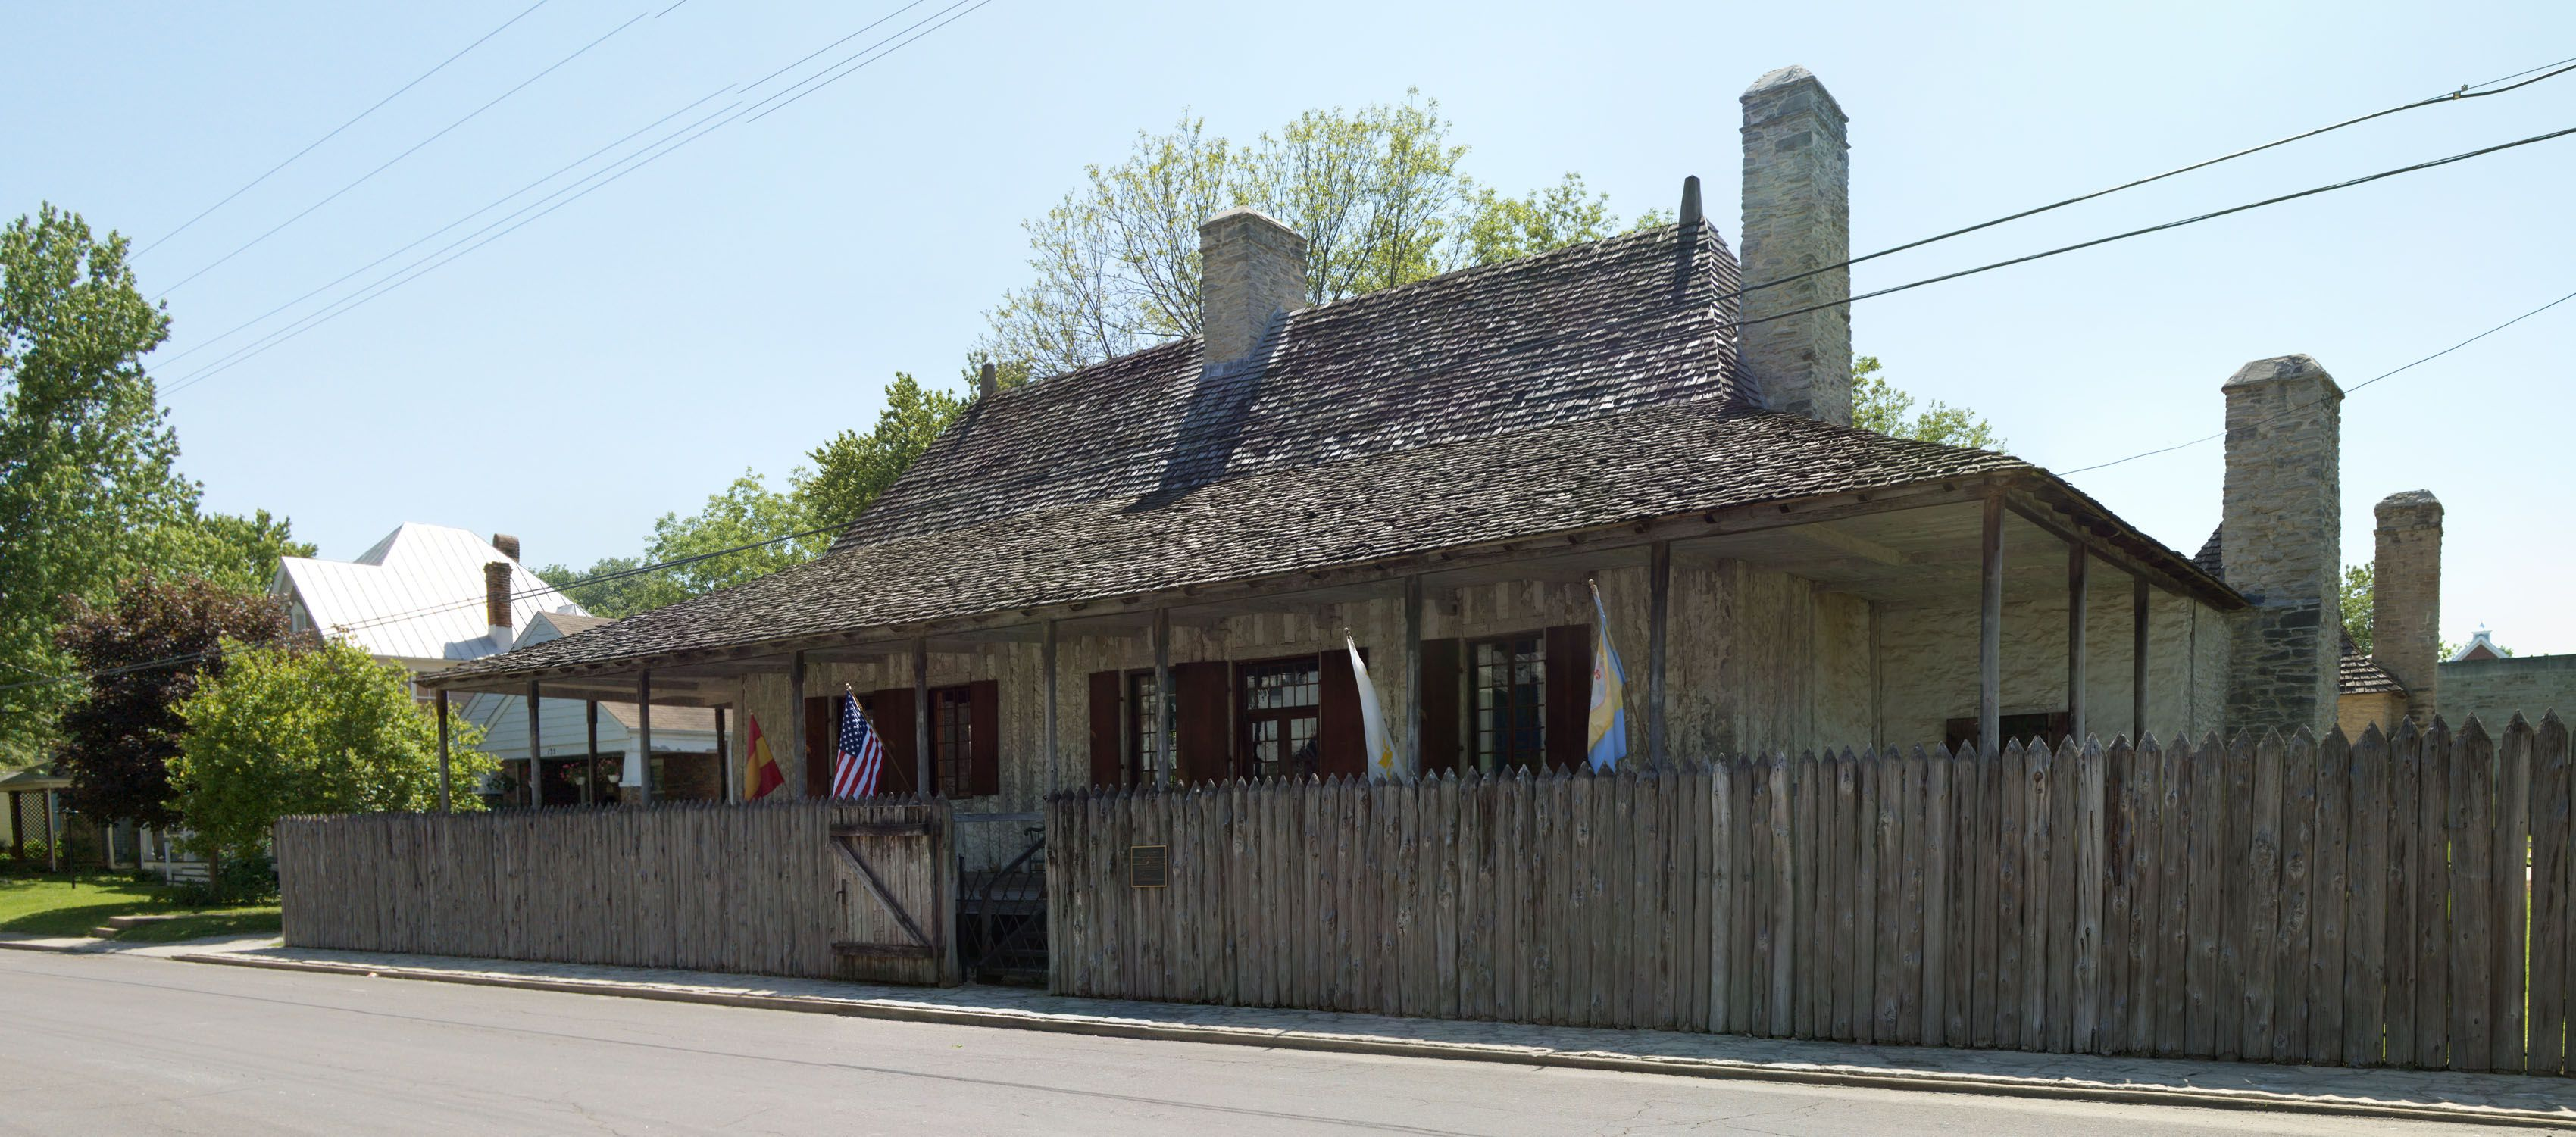 Bolduc house in Ste Genvieve, Missouri